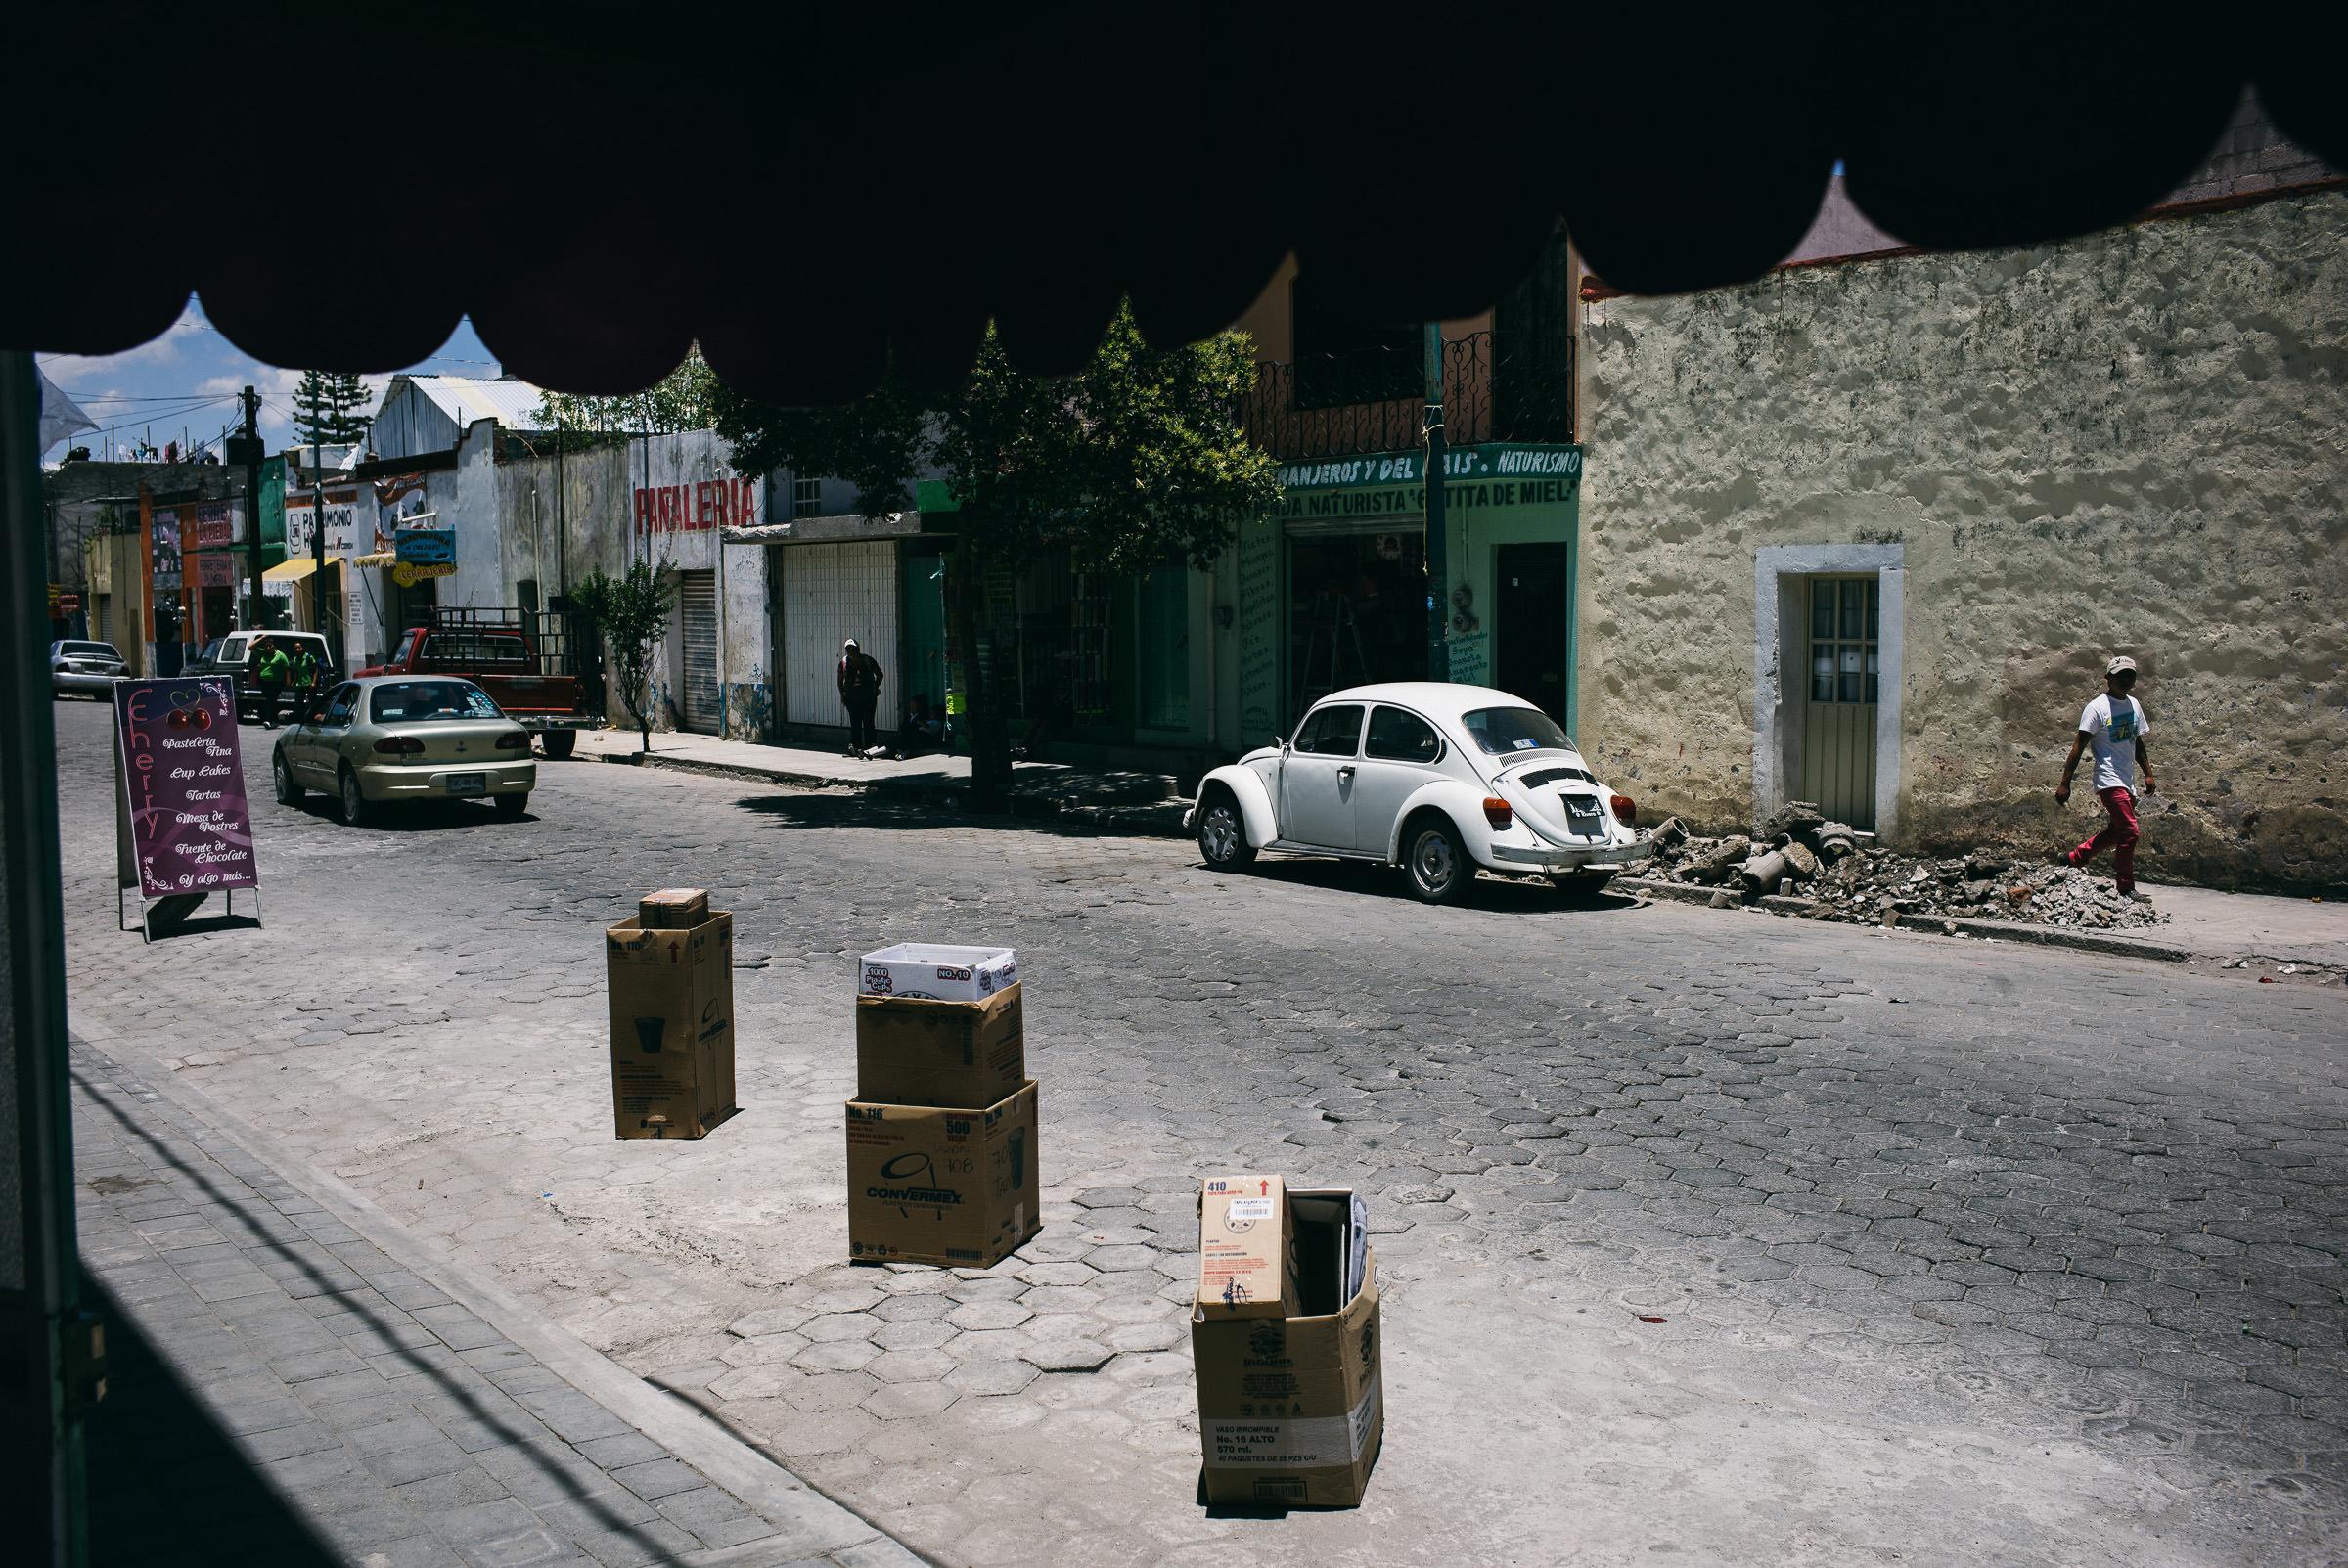 brandon_patoc_travel_photographer_in_mexico_0003.jpg